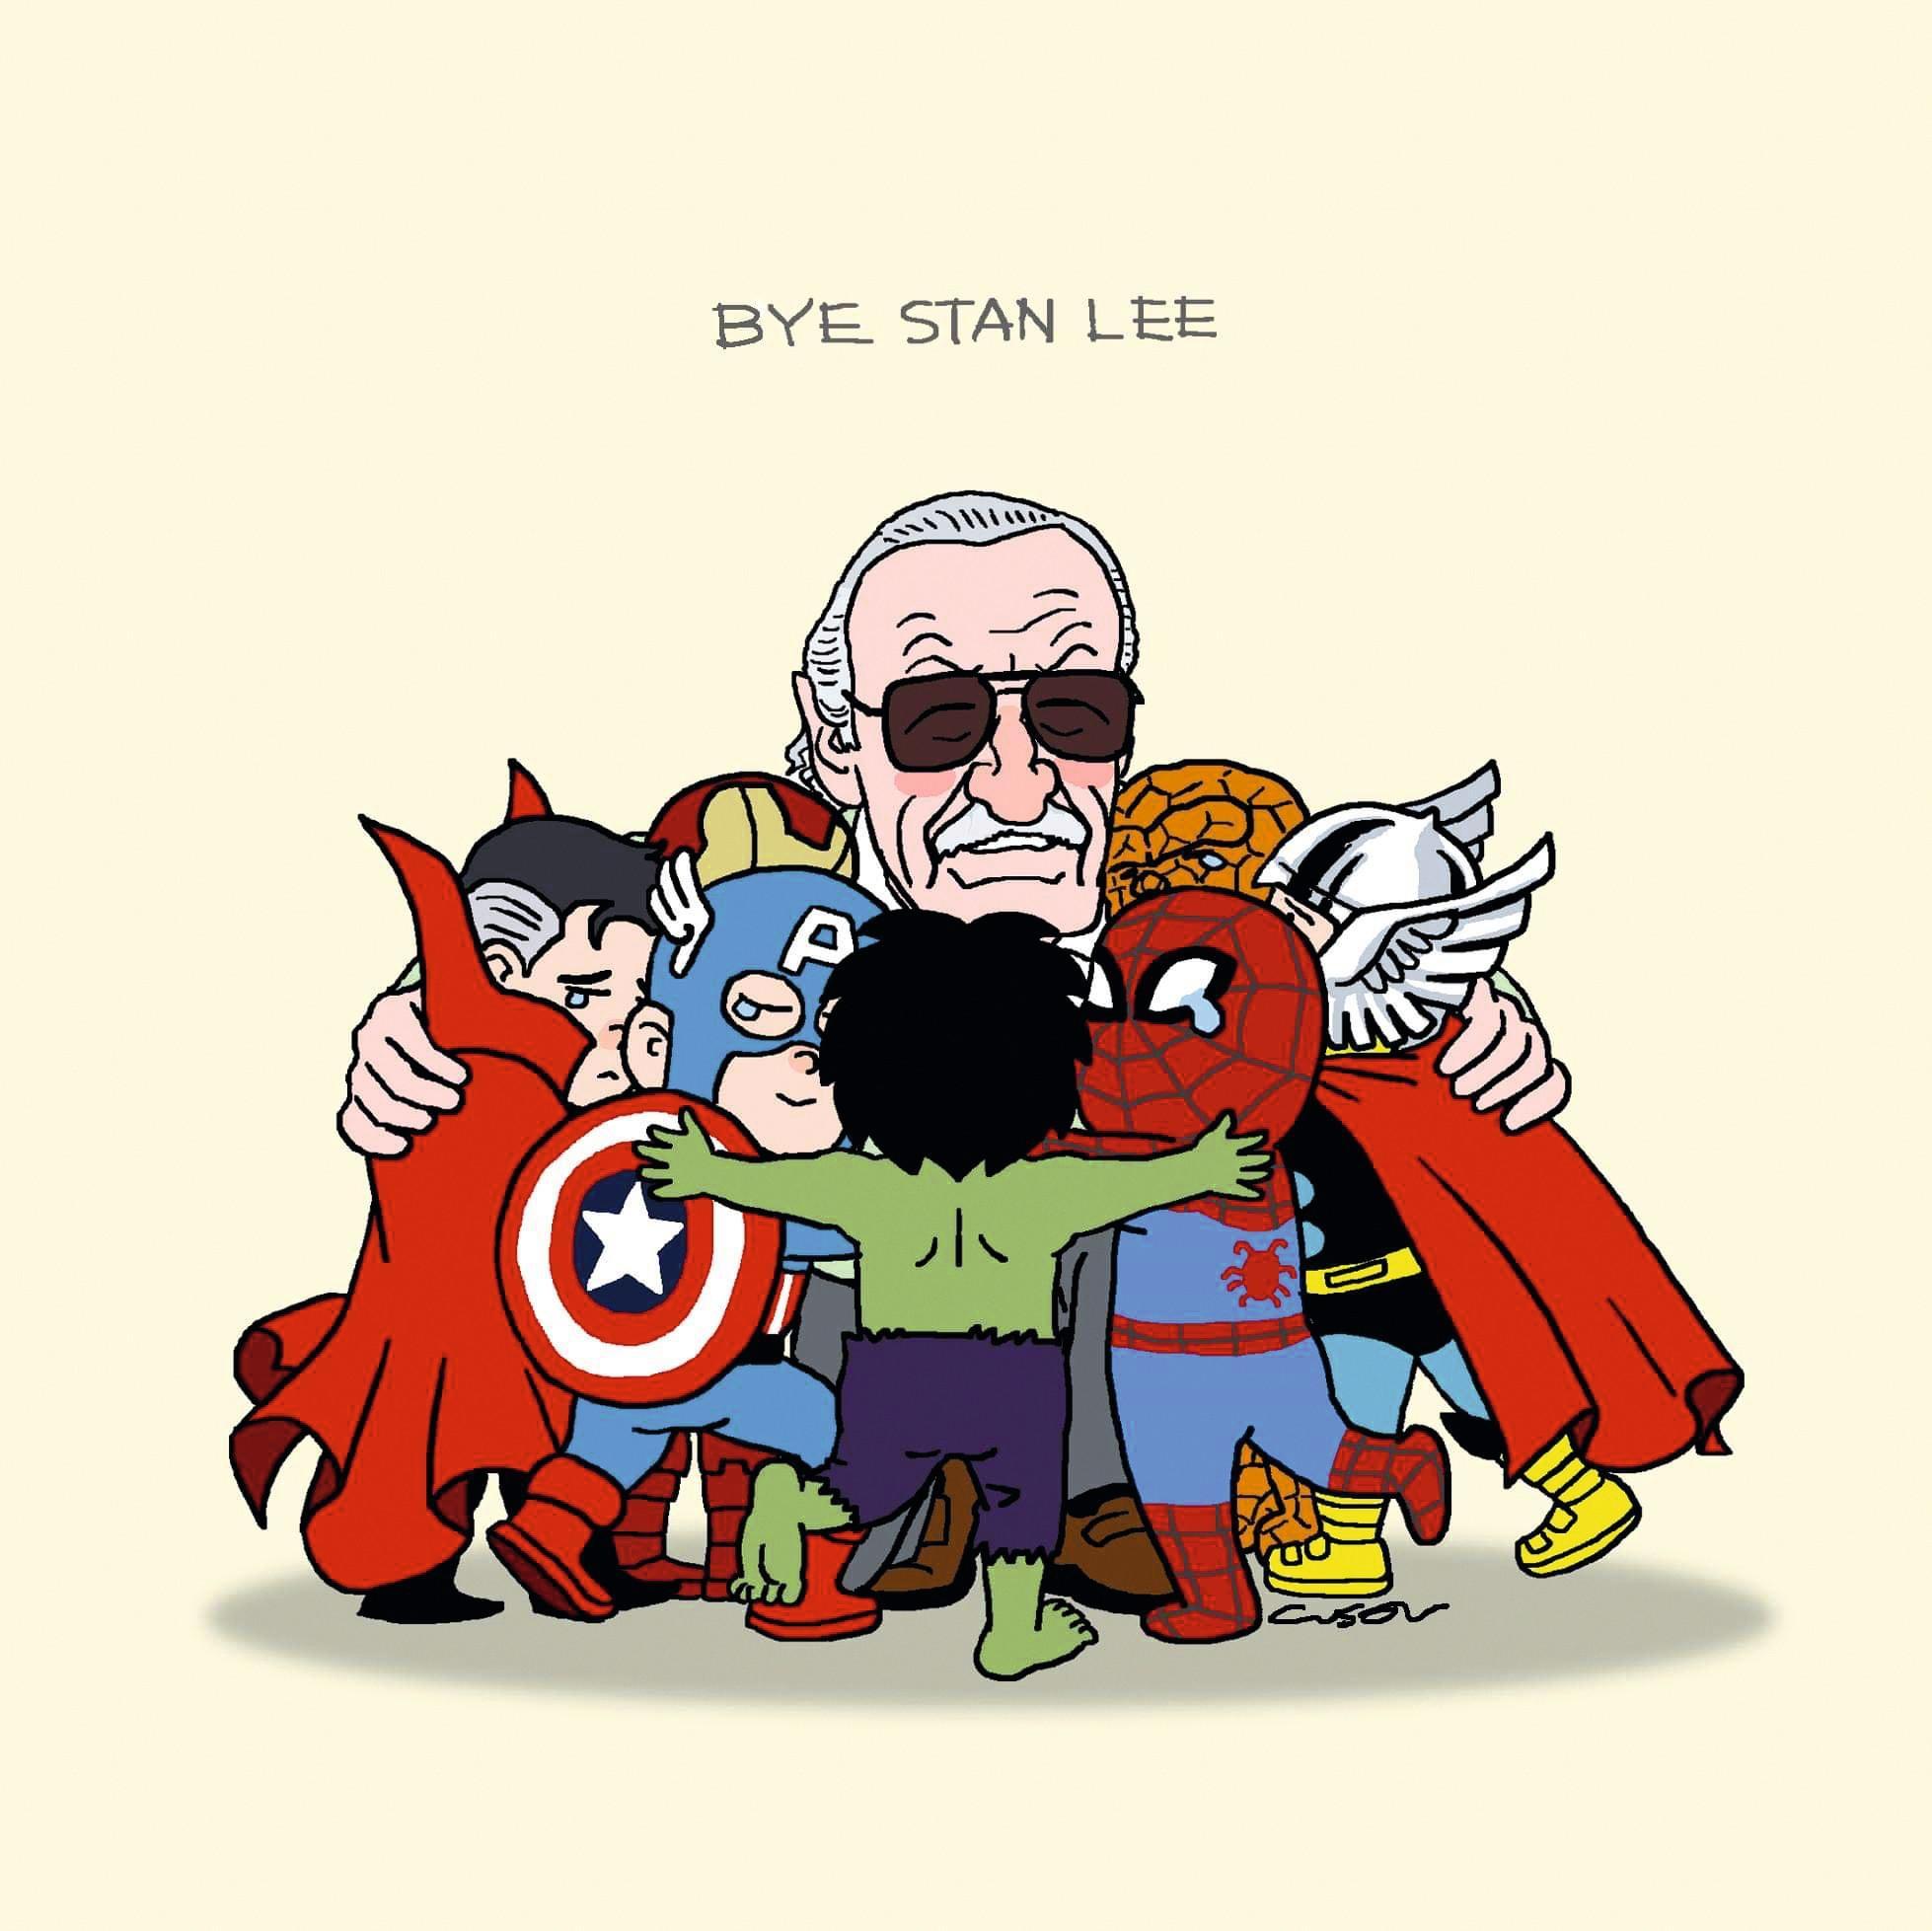 Bye Stan Lee, Cuson Lo, 2018